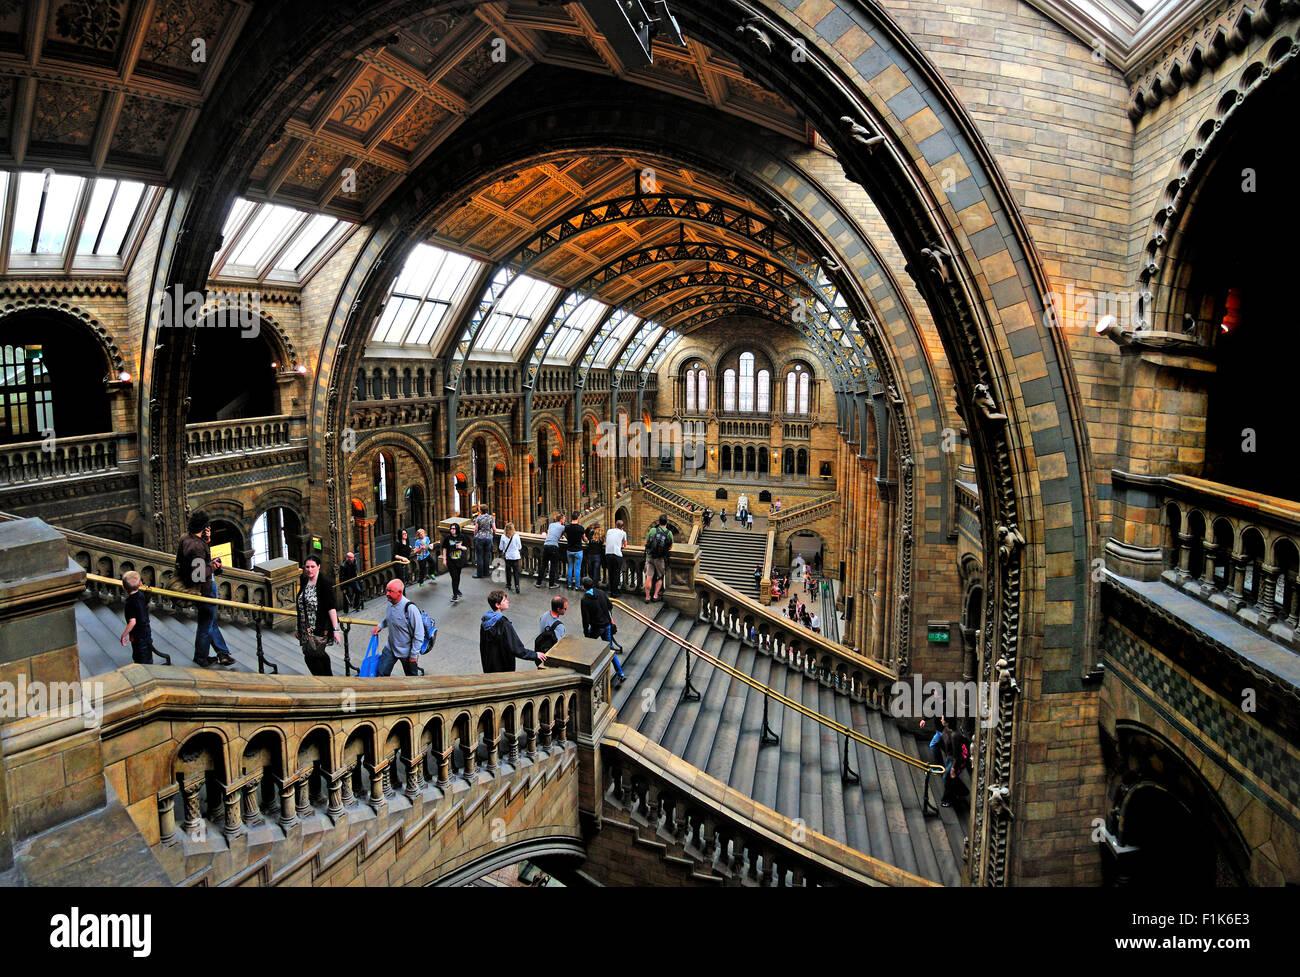 London, England, UK. Natural History Museum, Kensington. Interior - Stock Image